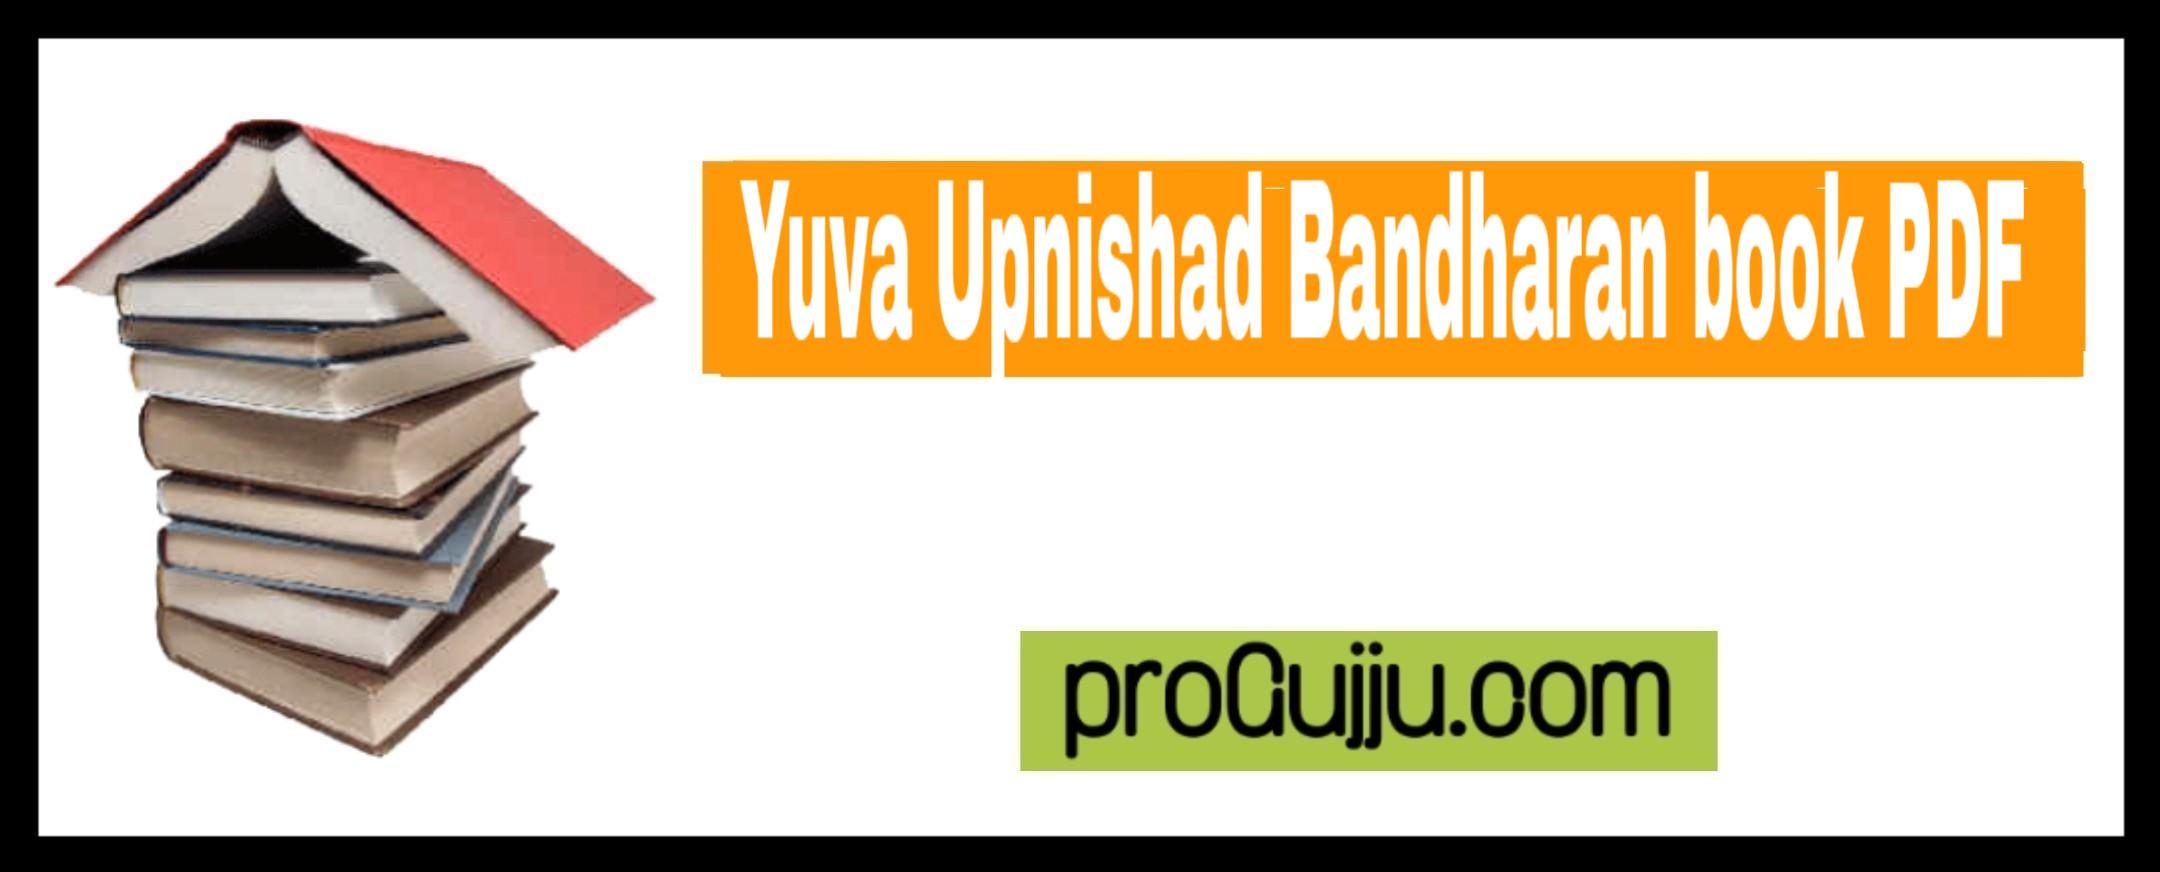 Yuva upnishad Bandharan Book PDF